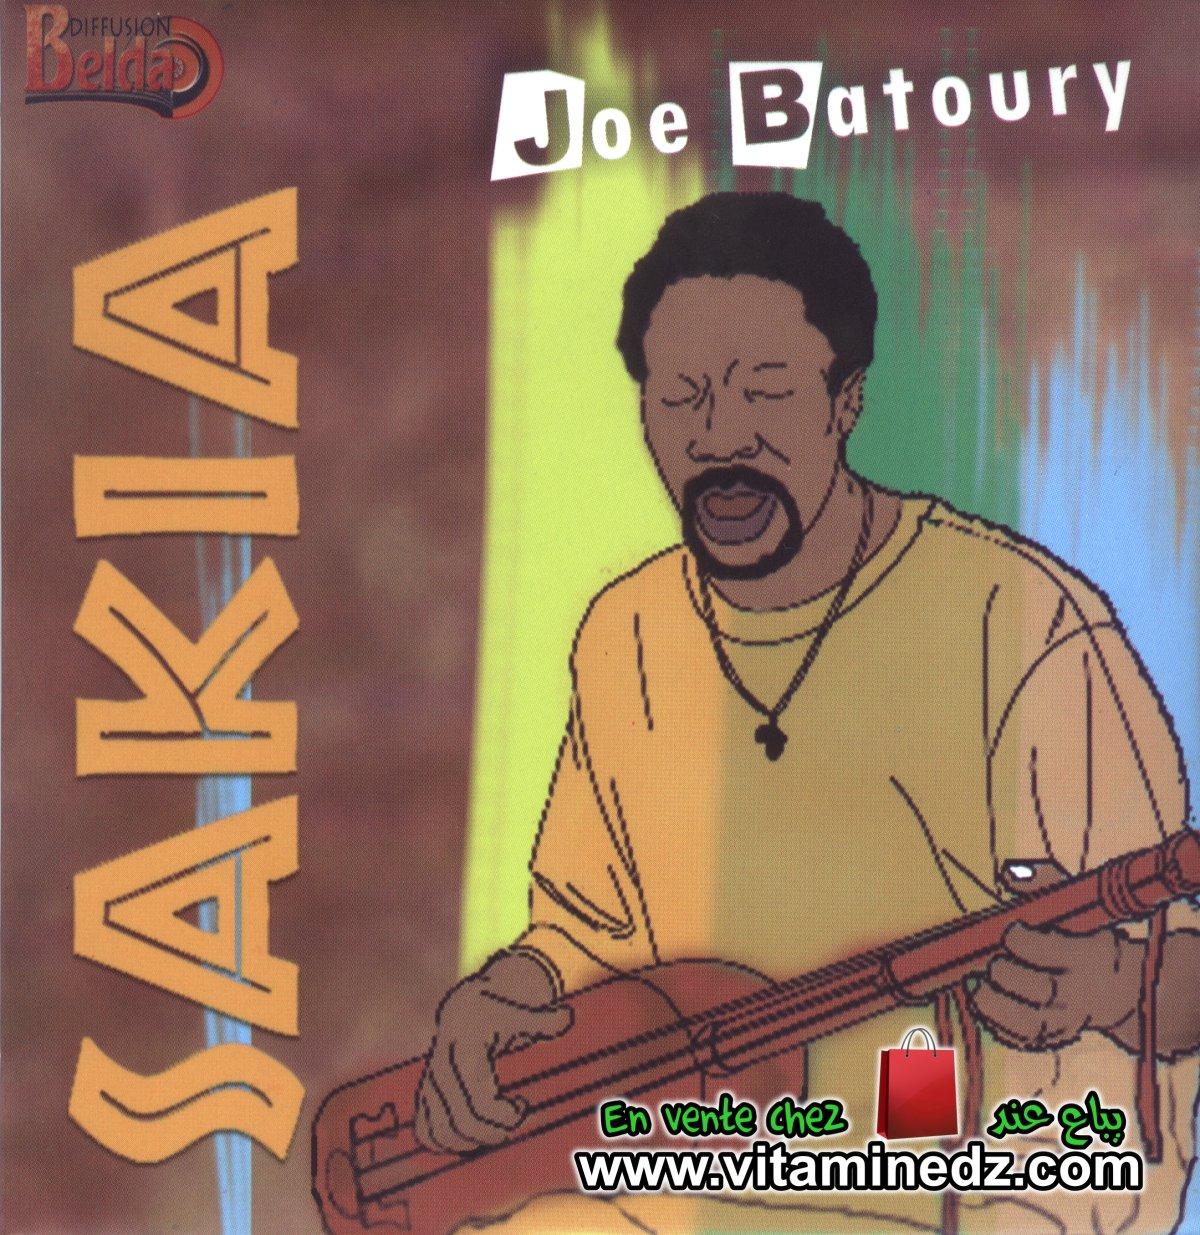 Joe Batoury - Sakia